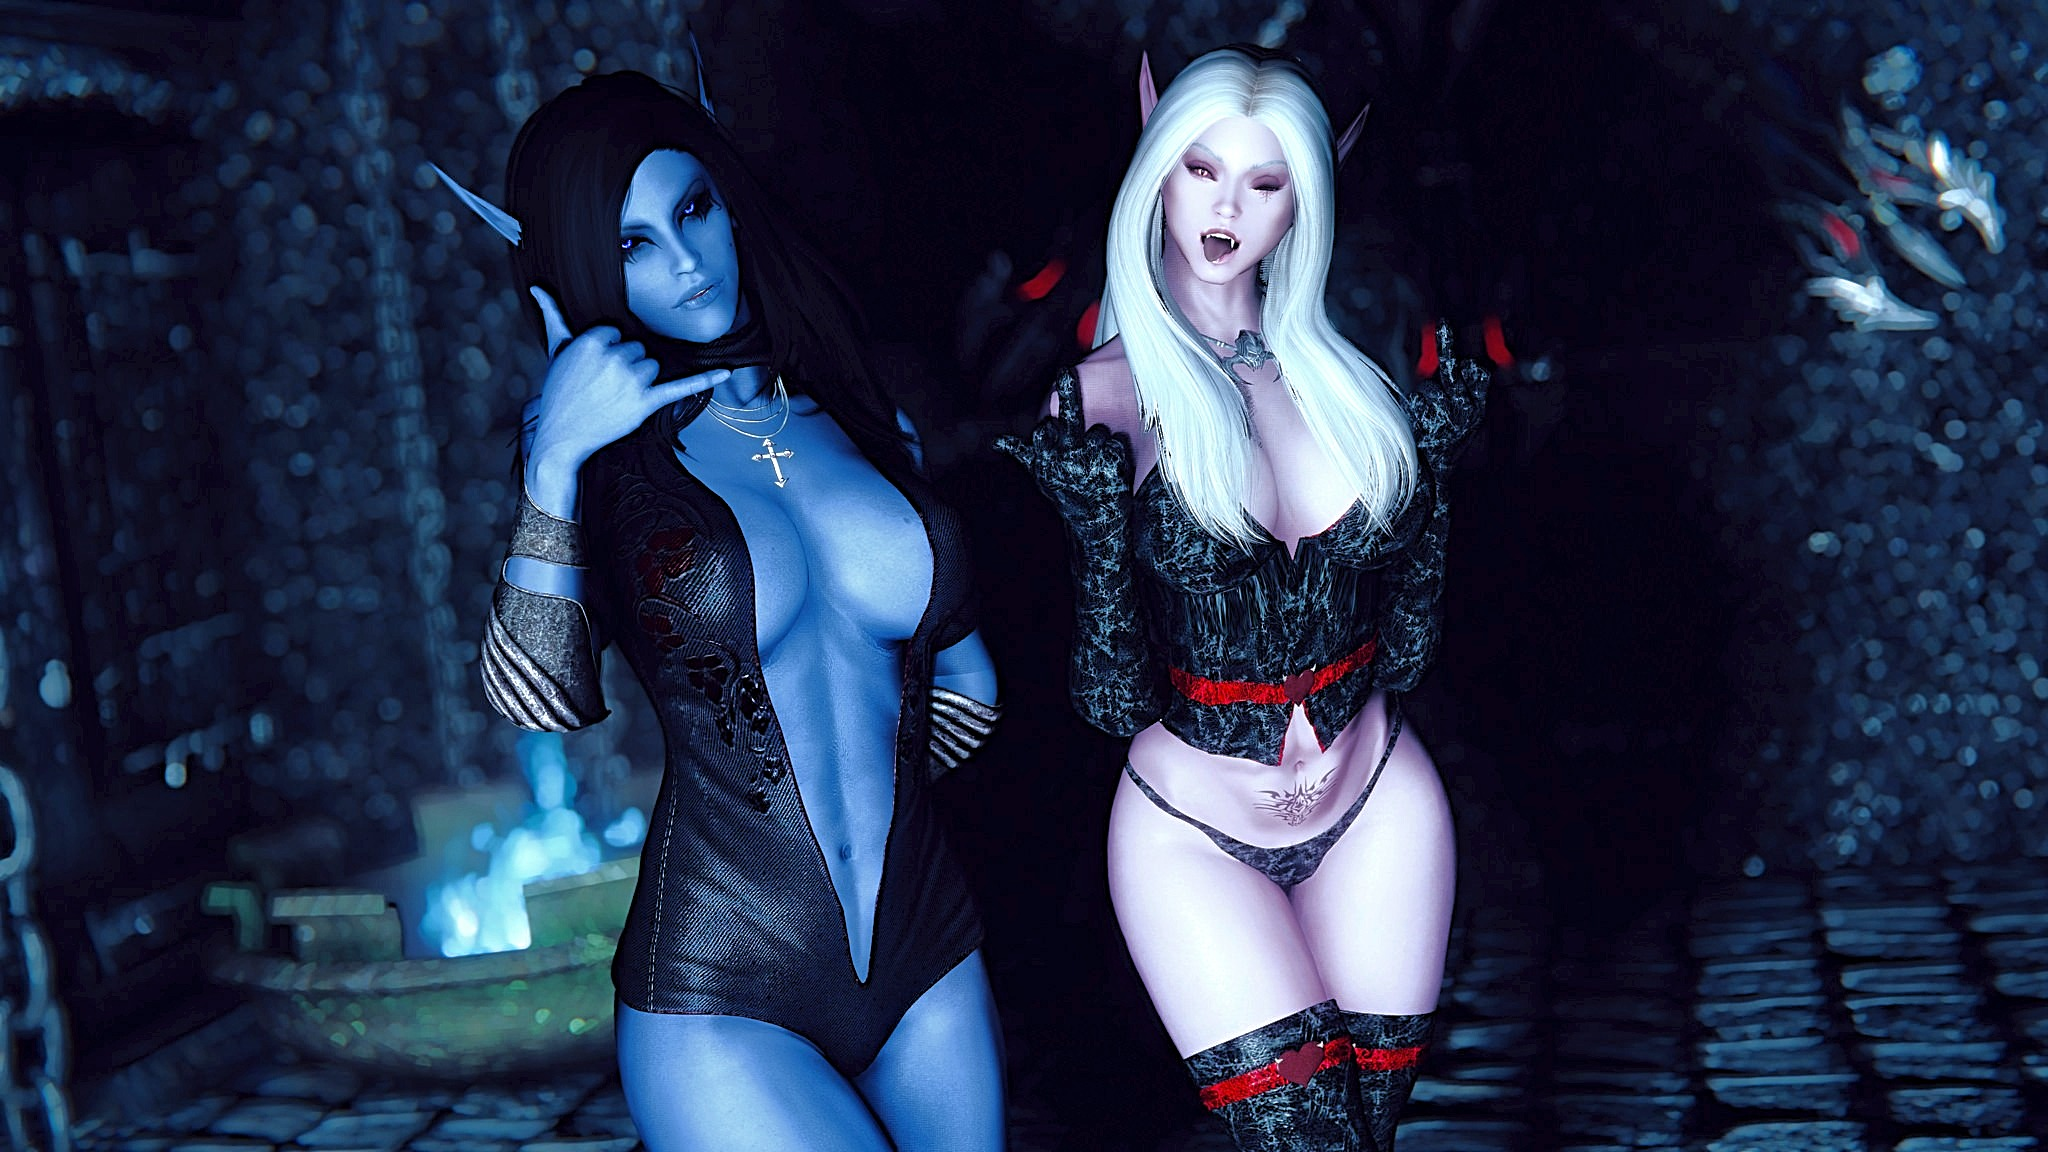 a (8).jpg - Elder Scrolls 5: Skyrim, the